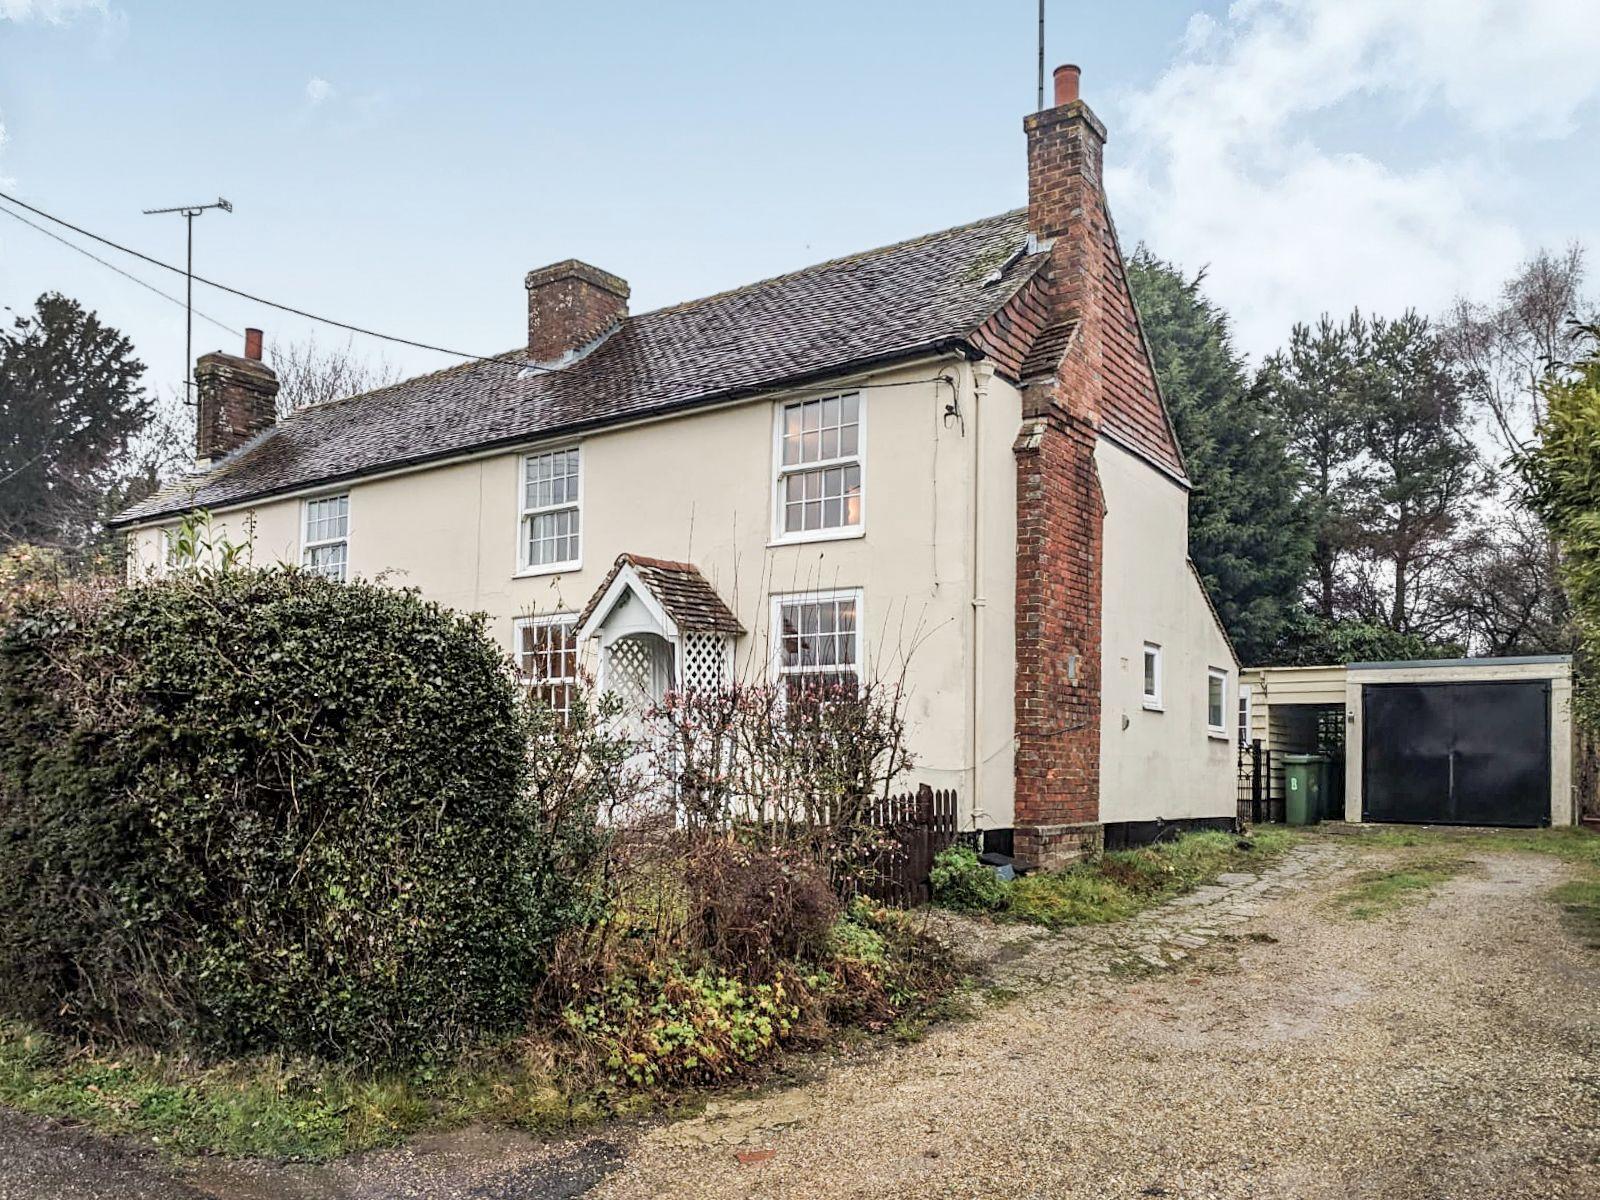 Mill Lane, Lower Beeding, Horsham